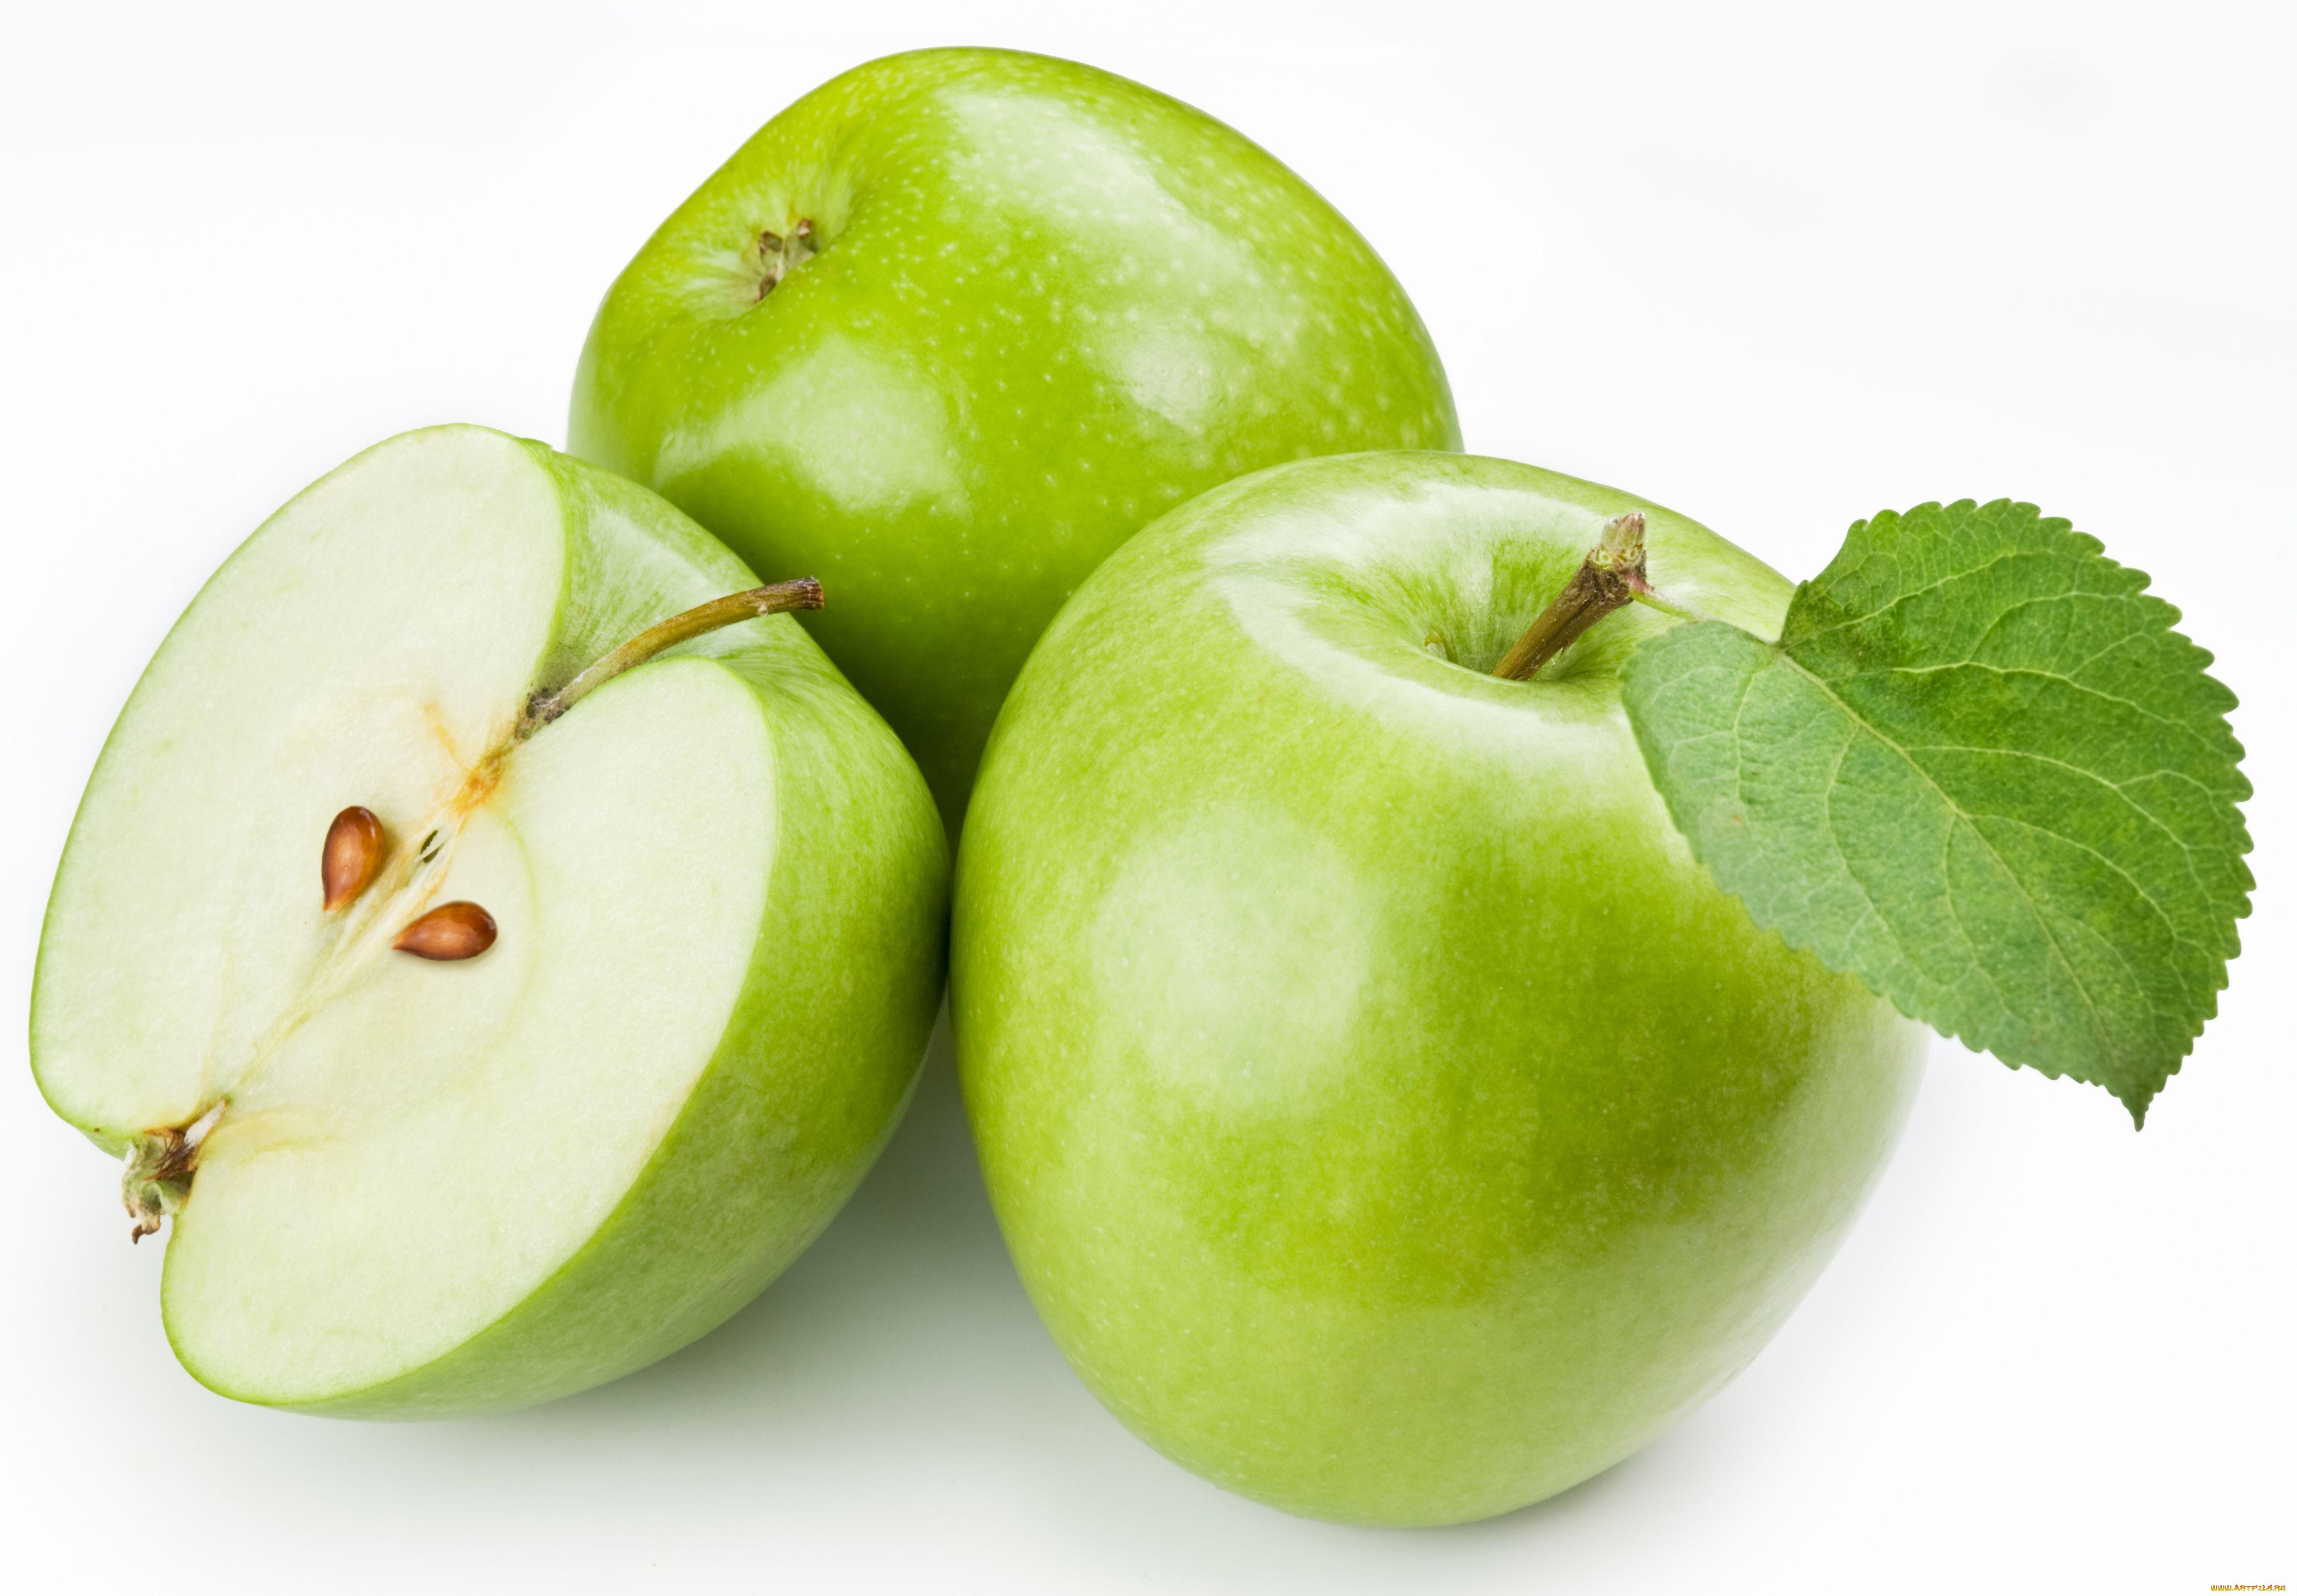 картинки на тему яблок последнее время